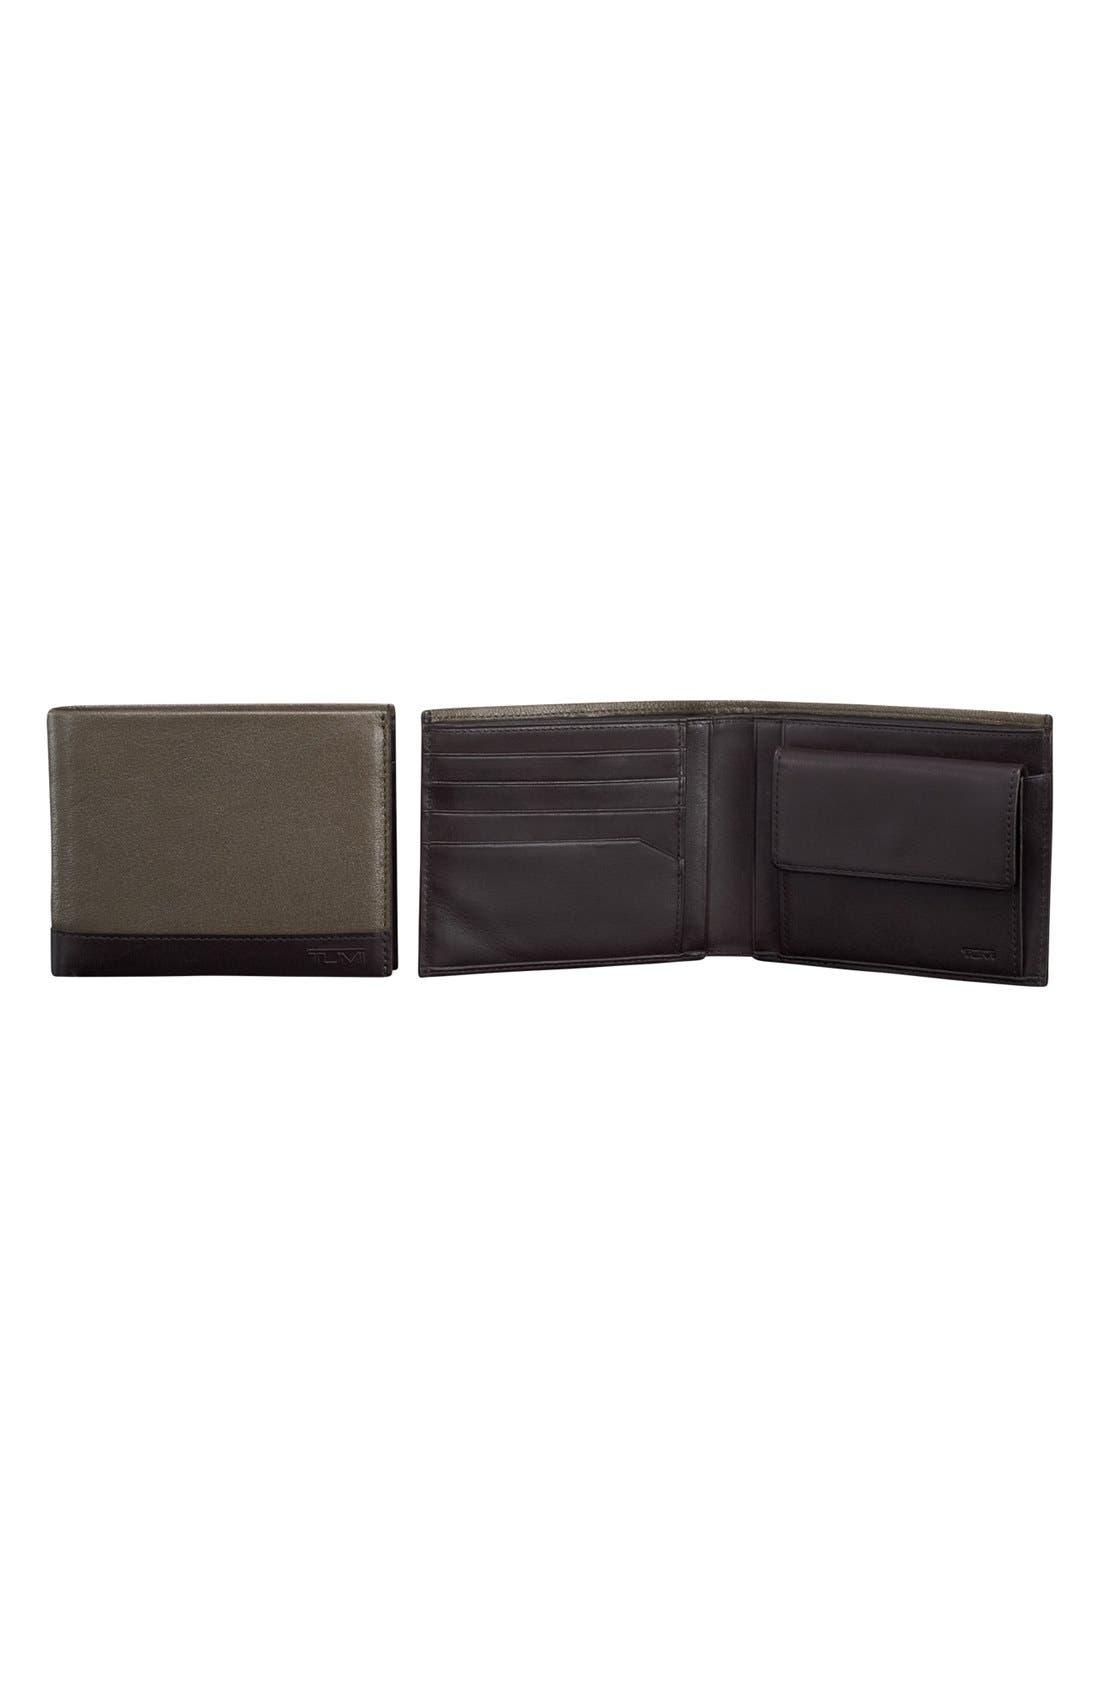 Main Image - Tumi 'Rivington Global' Leather Coin Wallet